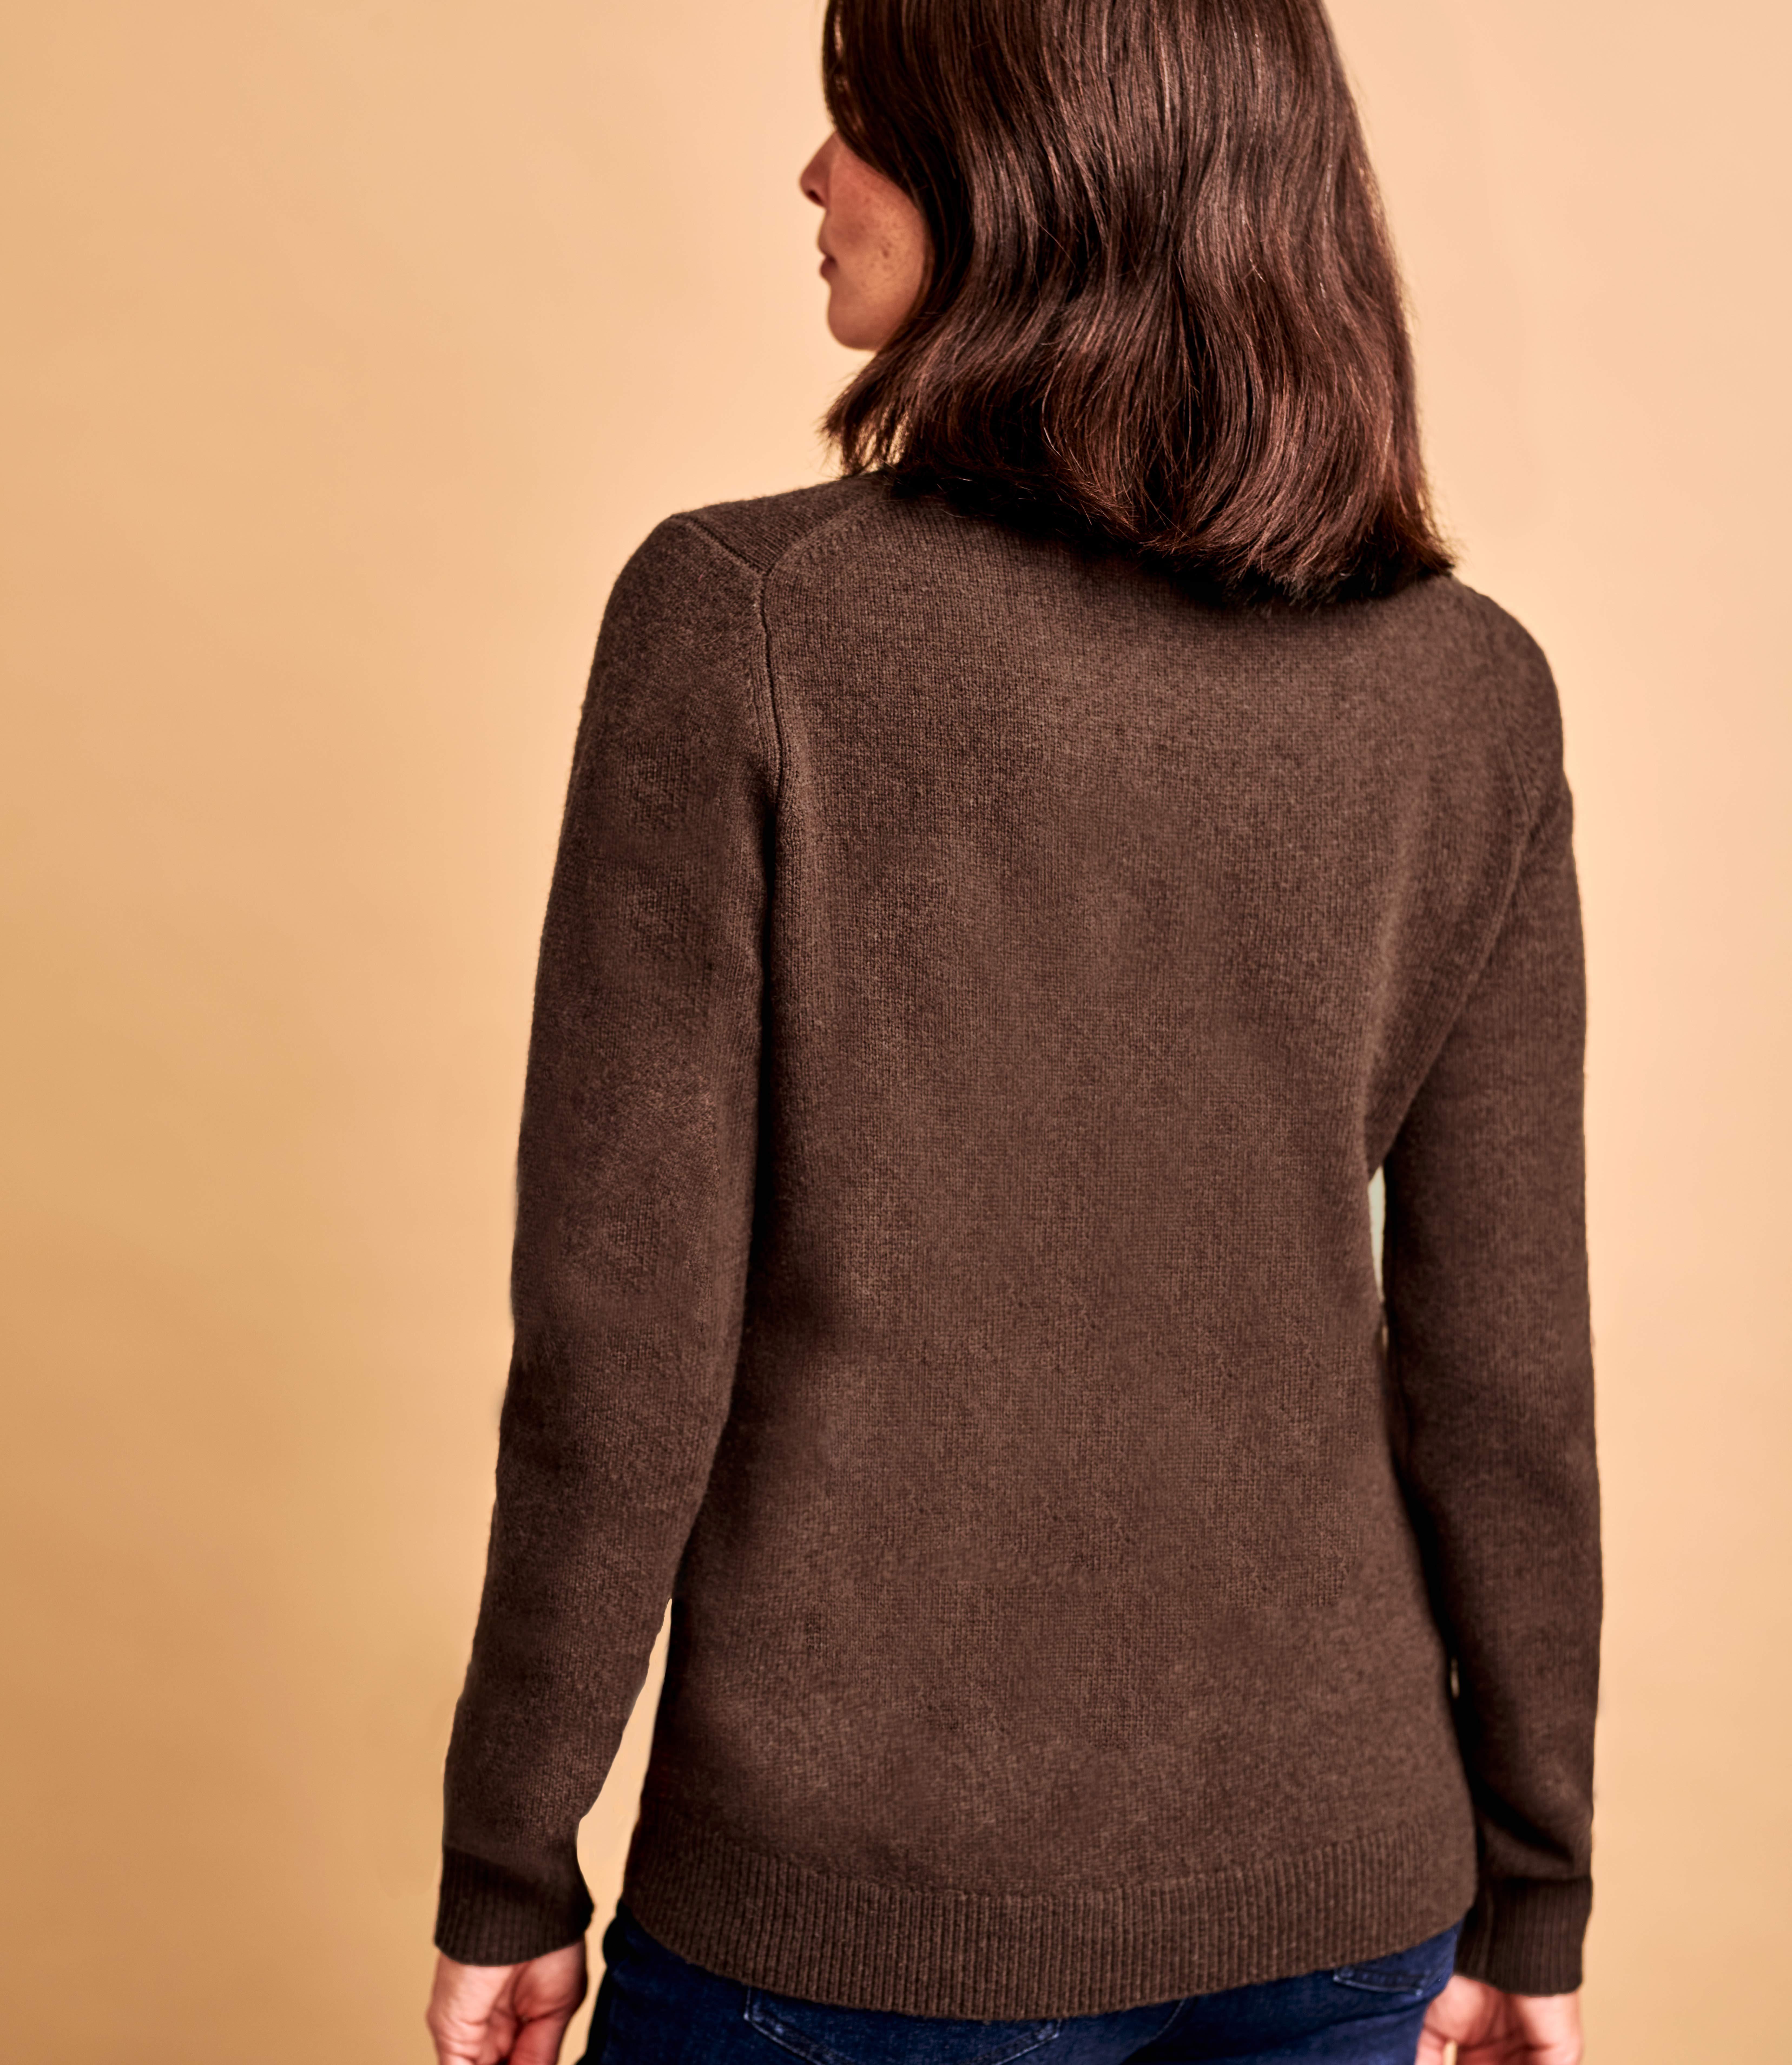 Женский свитер из натуральной шерсти ягненка